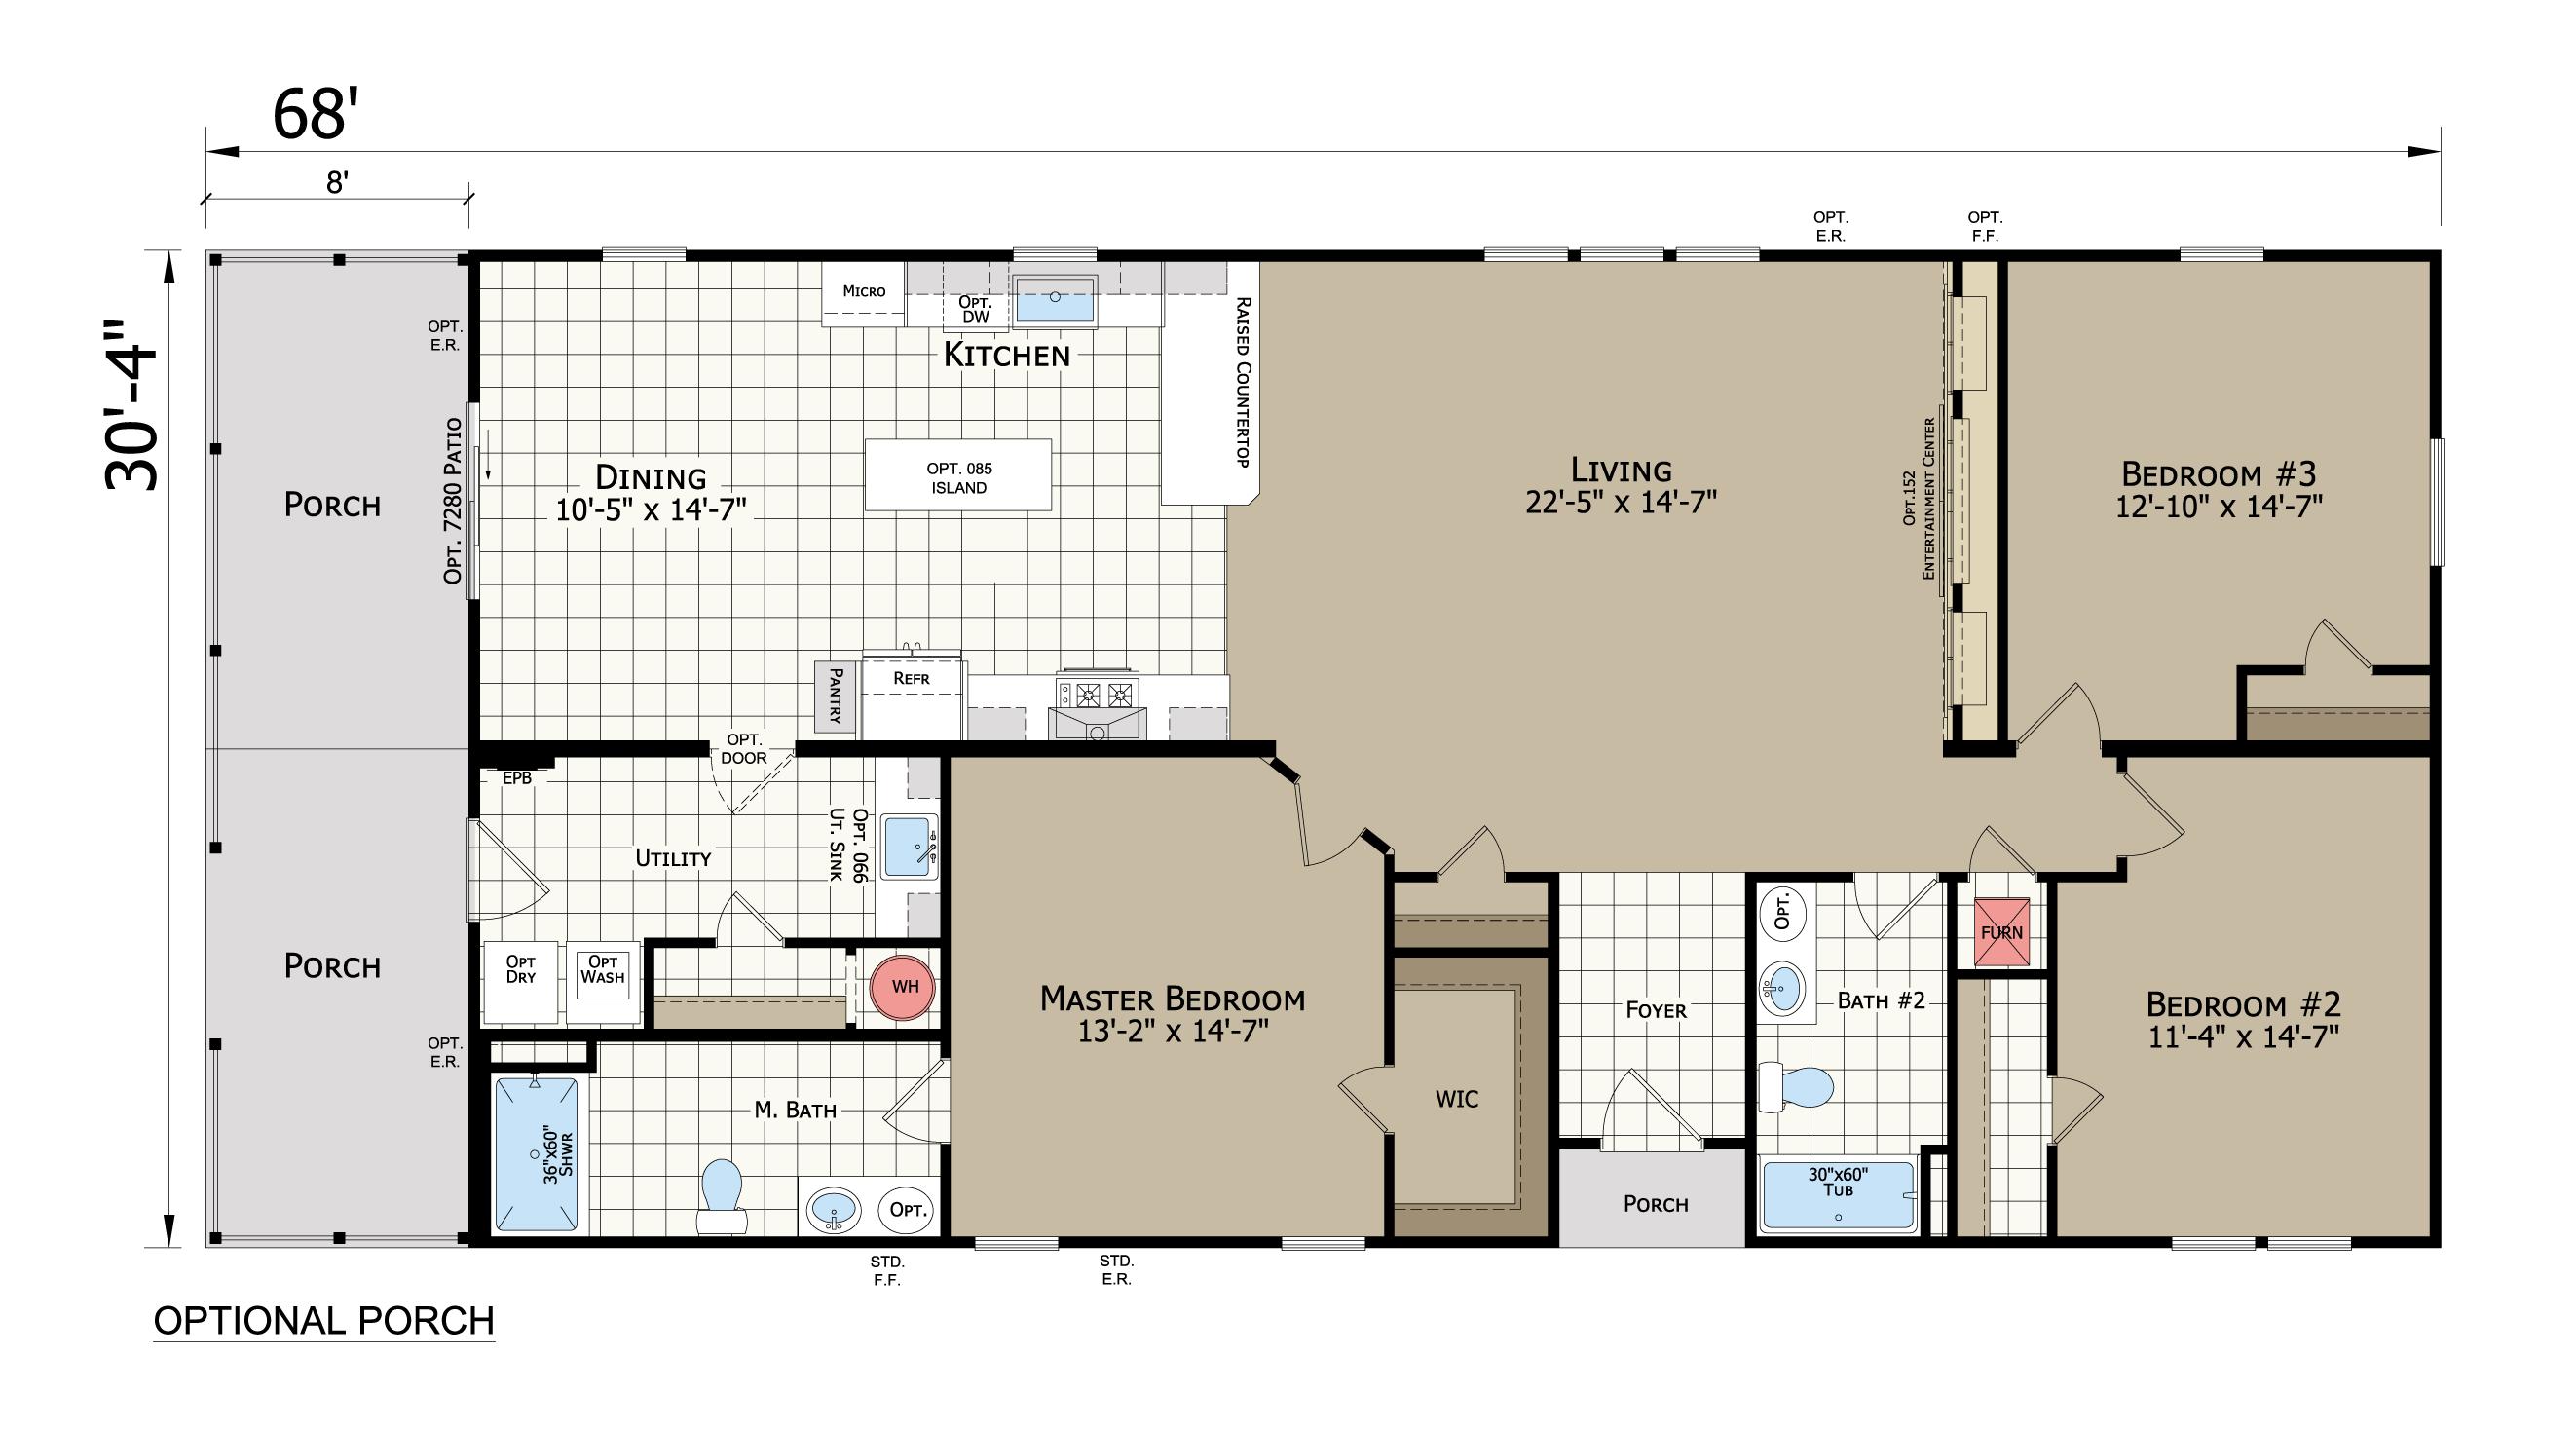 floorplan image for unit 314